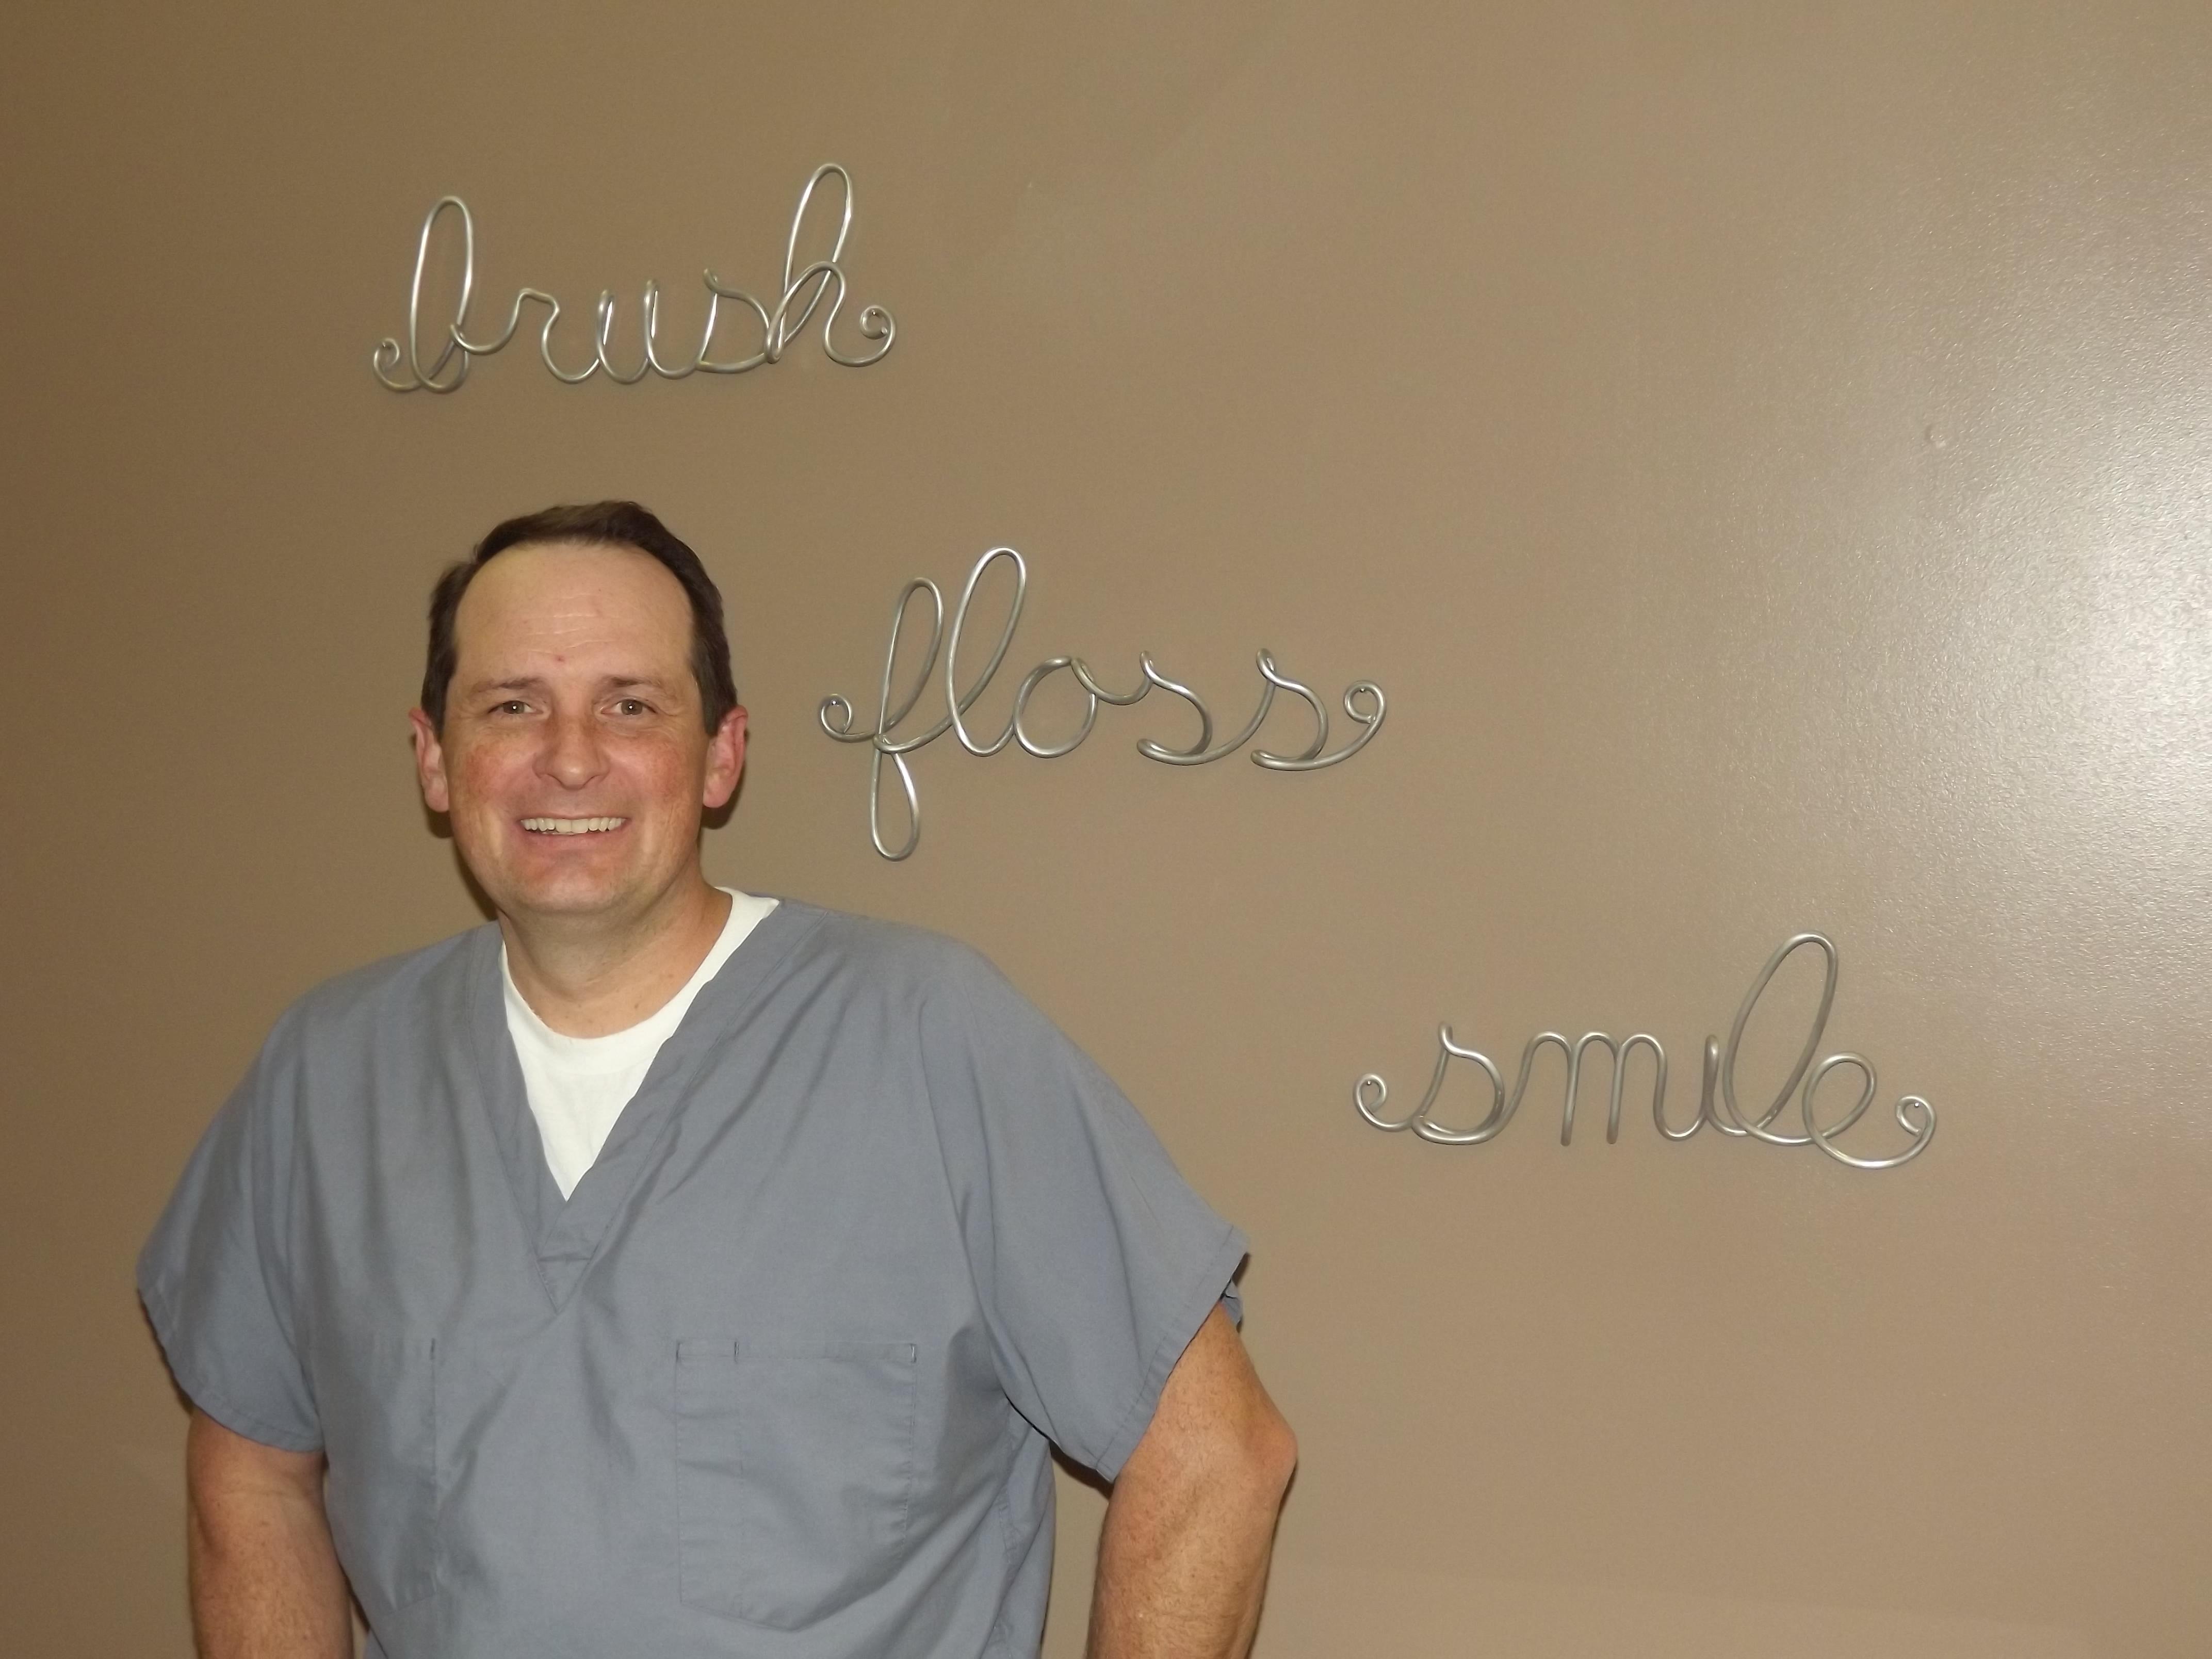 Bonners Ferry Family Dentistry - Mark H. Beazer, DMD | 6466 Main St, Bonners Ferry, ID, 83805 | +1 (208) 267-7571